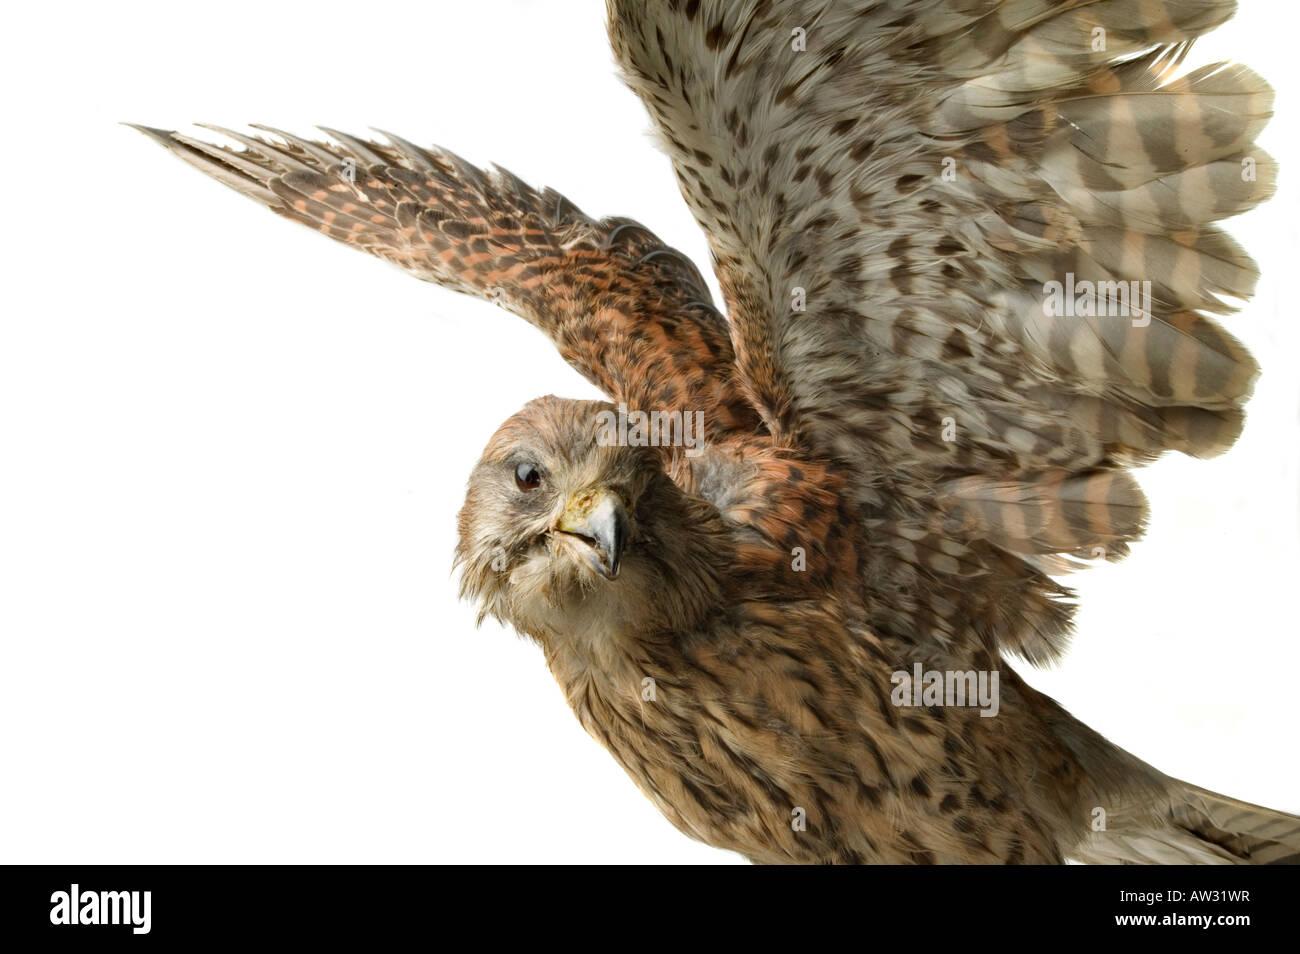 falcon hawk stuffed bird - Stock Image